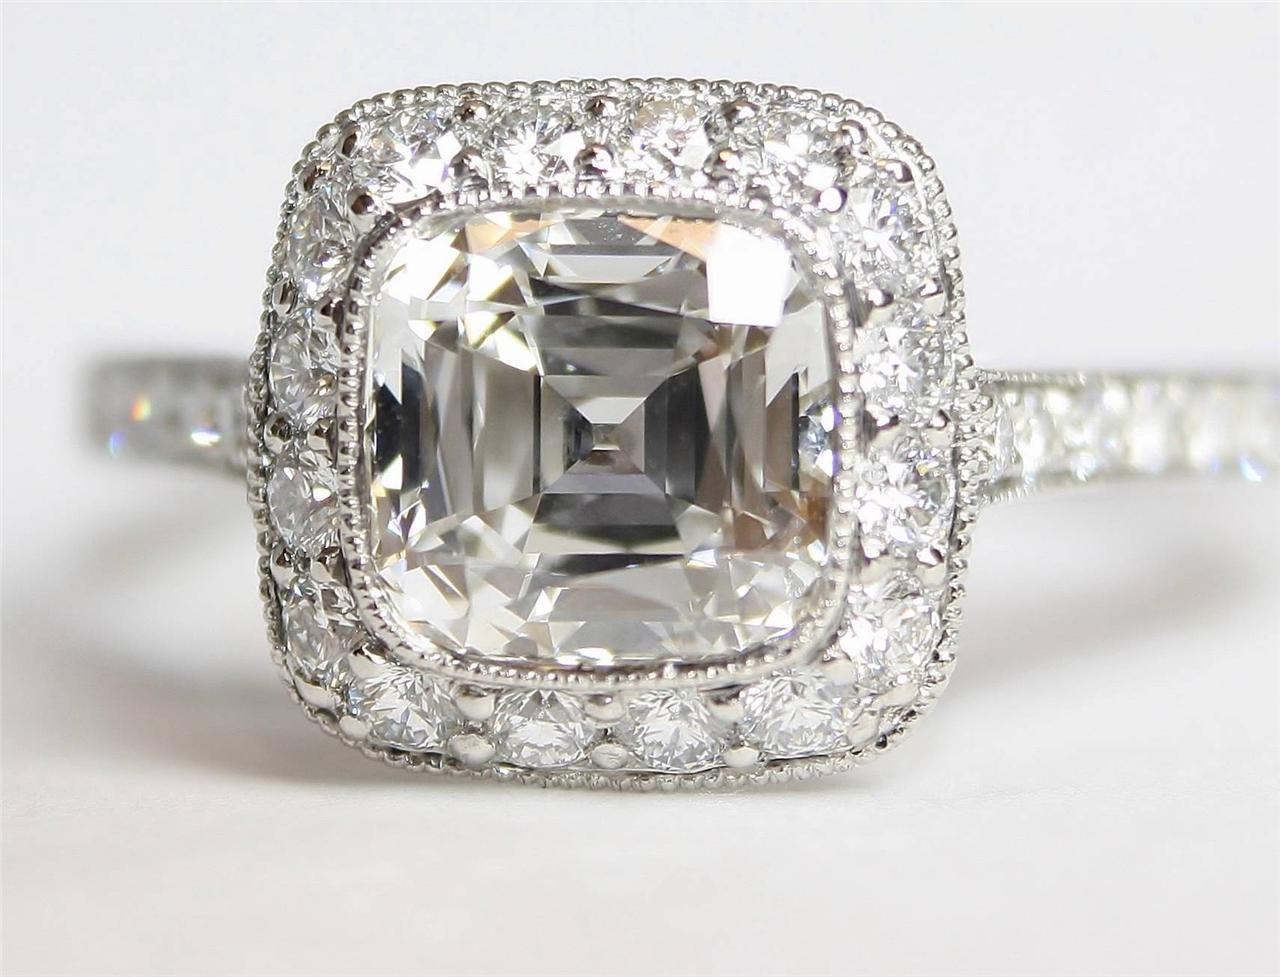 Sell a Tiffany Diamond Ring